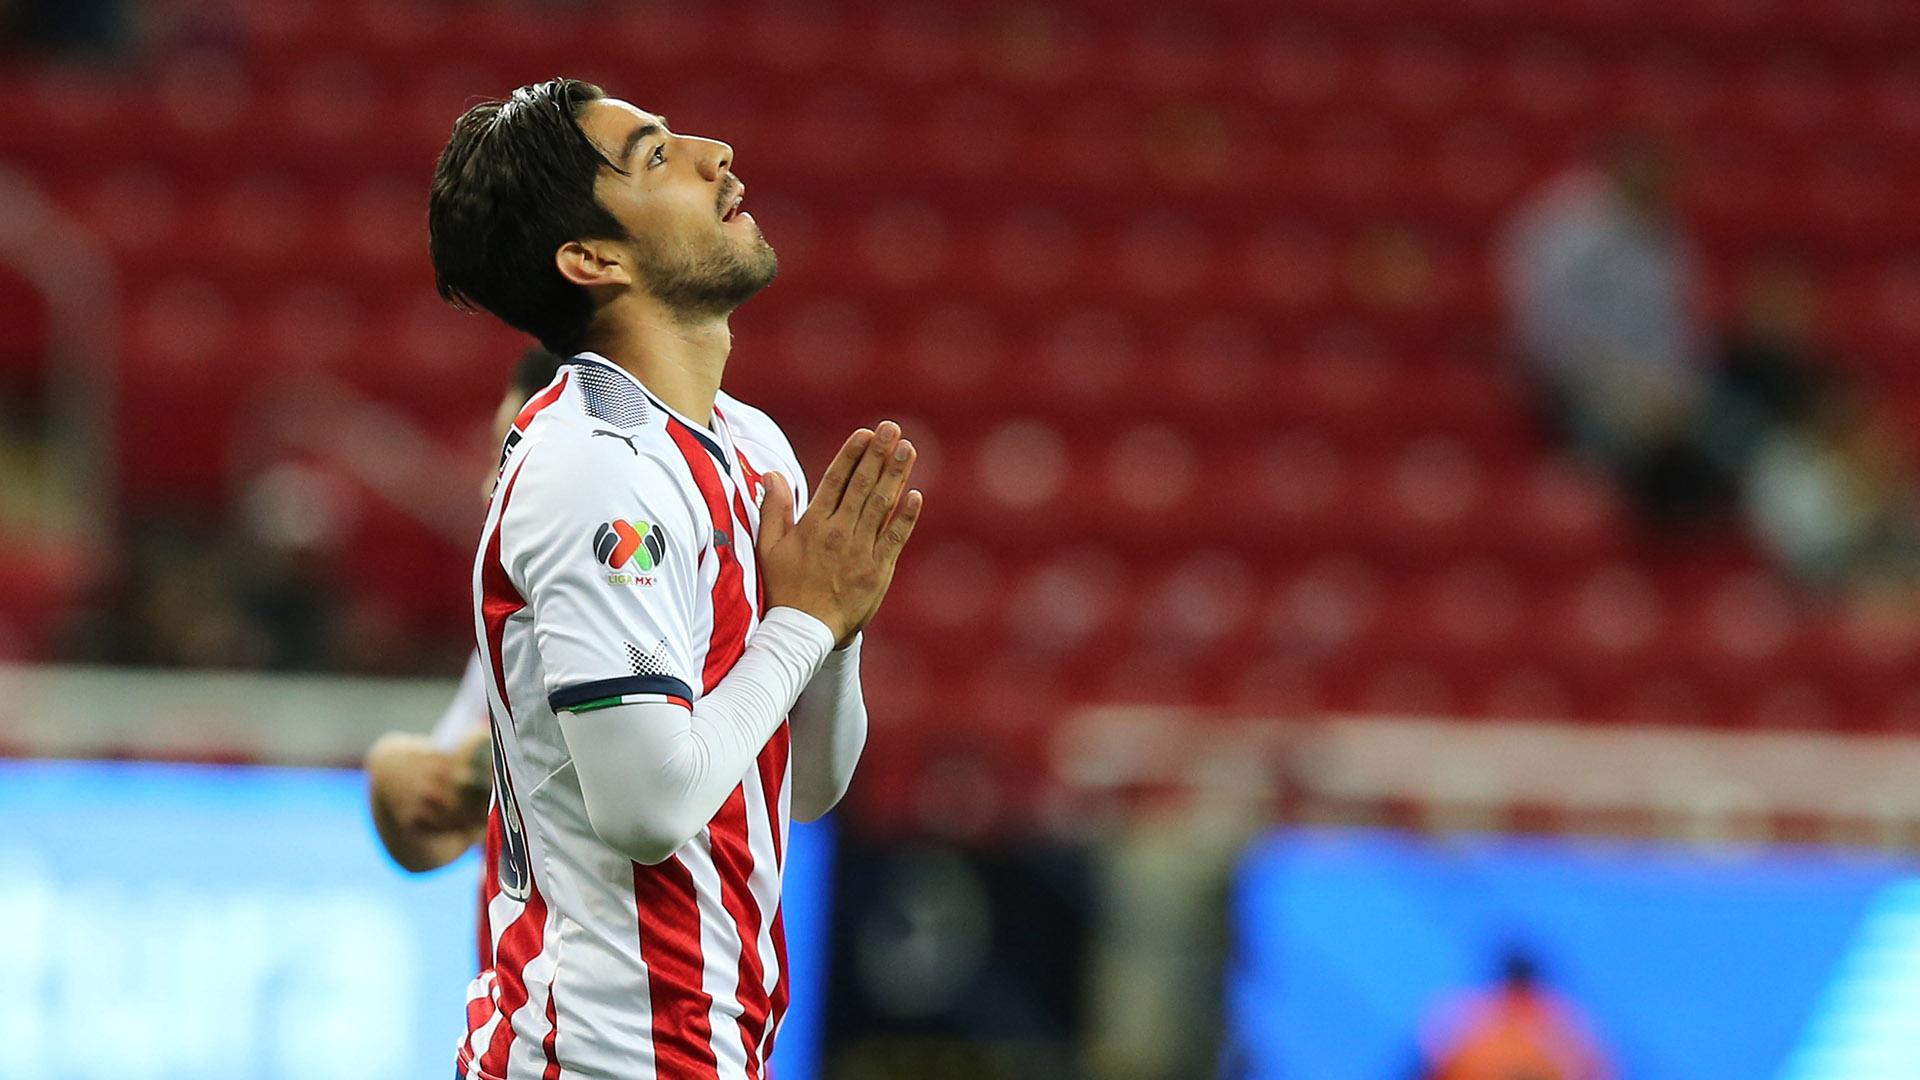 Rodolfo Pizarro Liga MX 2018